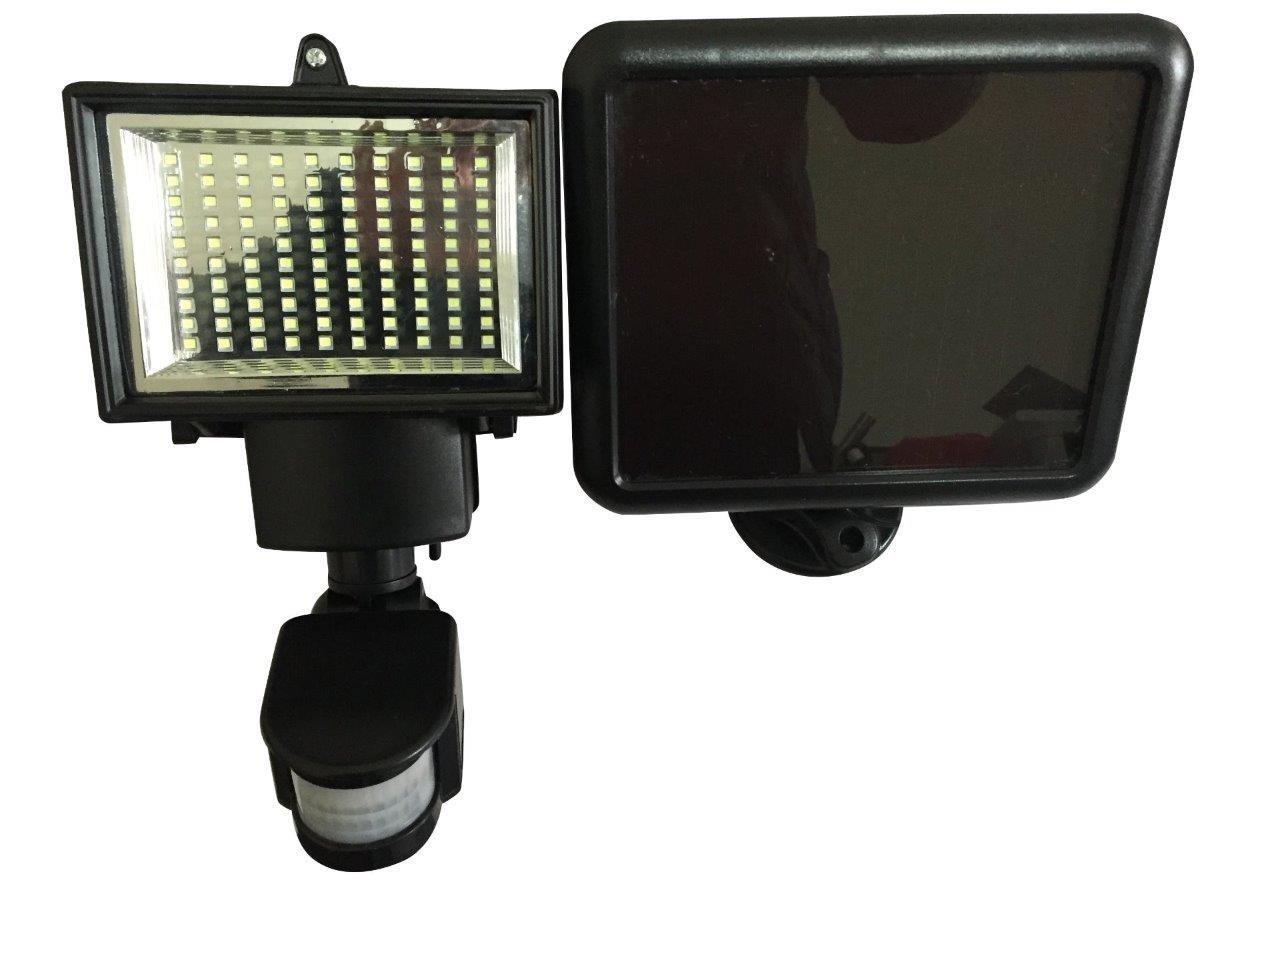 High output solar spot light - Amazon Com Lightahead 100 Led Solar Motion Sensor Flood Light Waterproof All Weather 100 Bright White Smd High Output Leds Solar Security Light